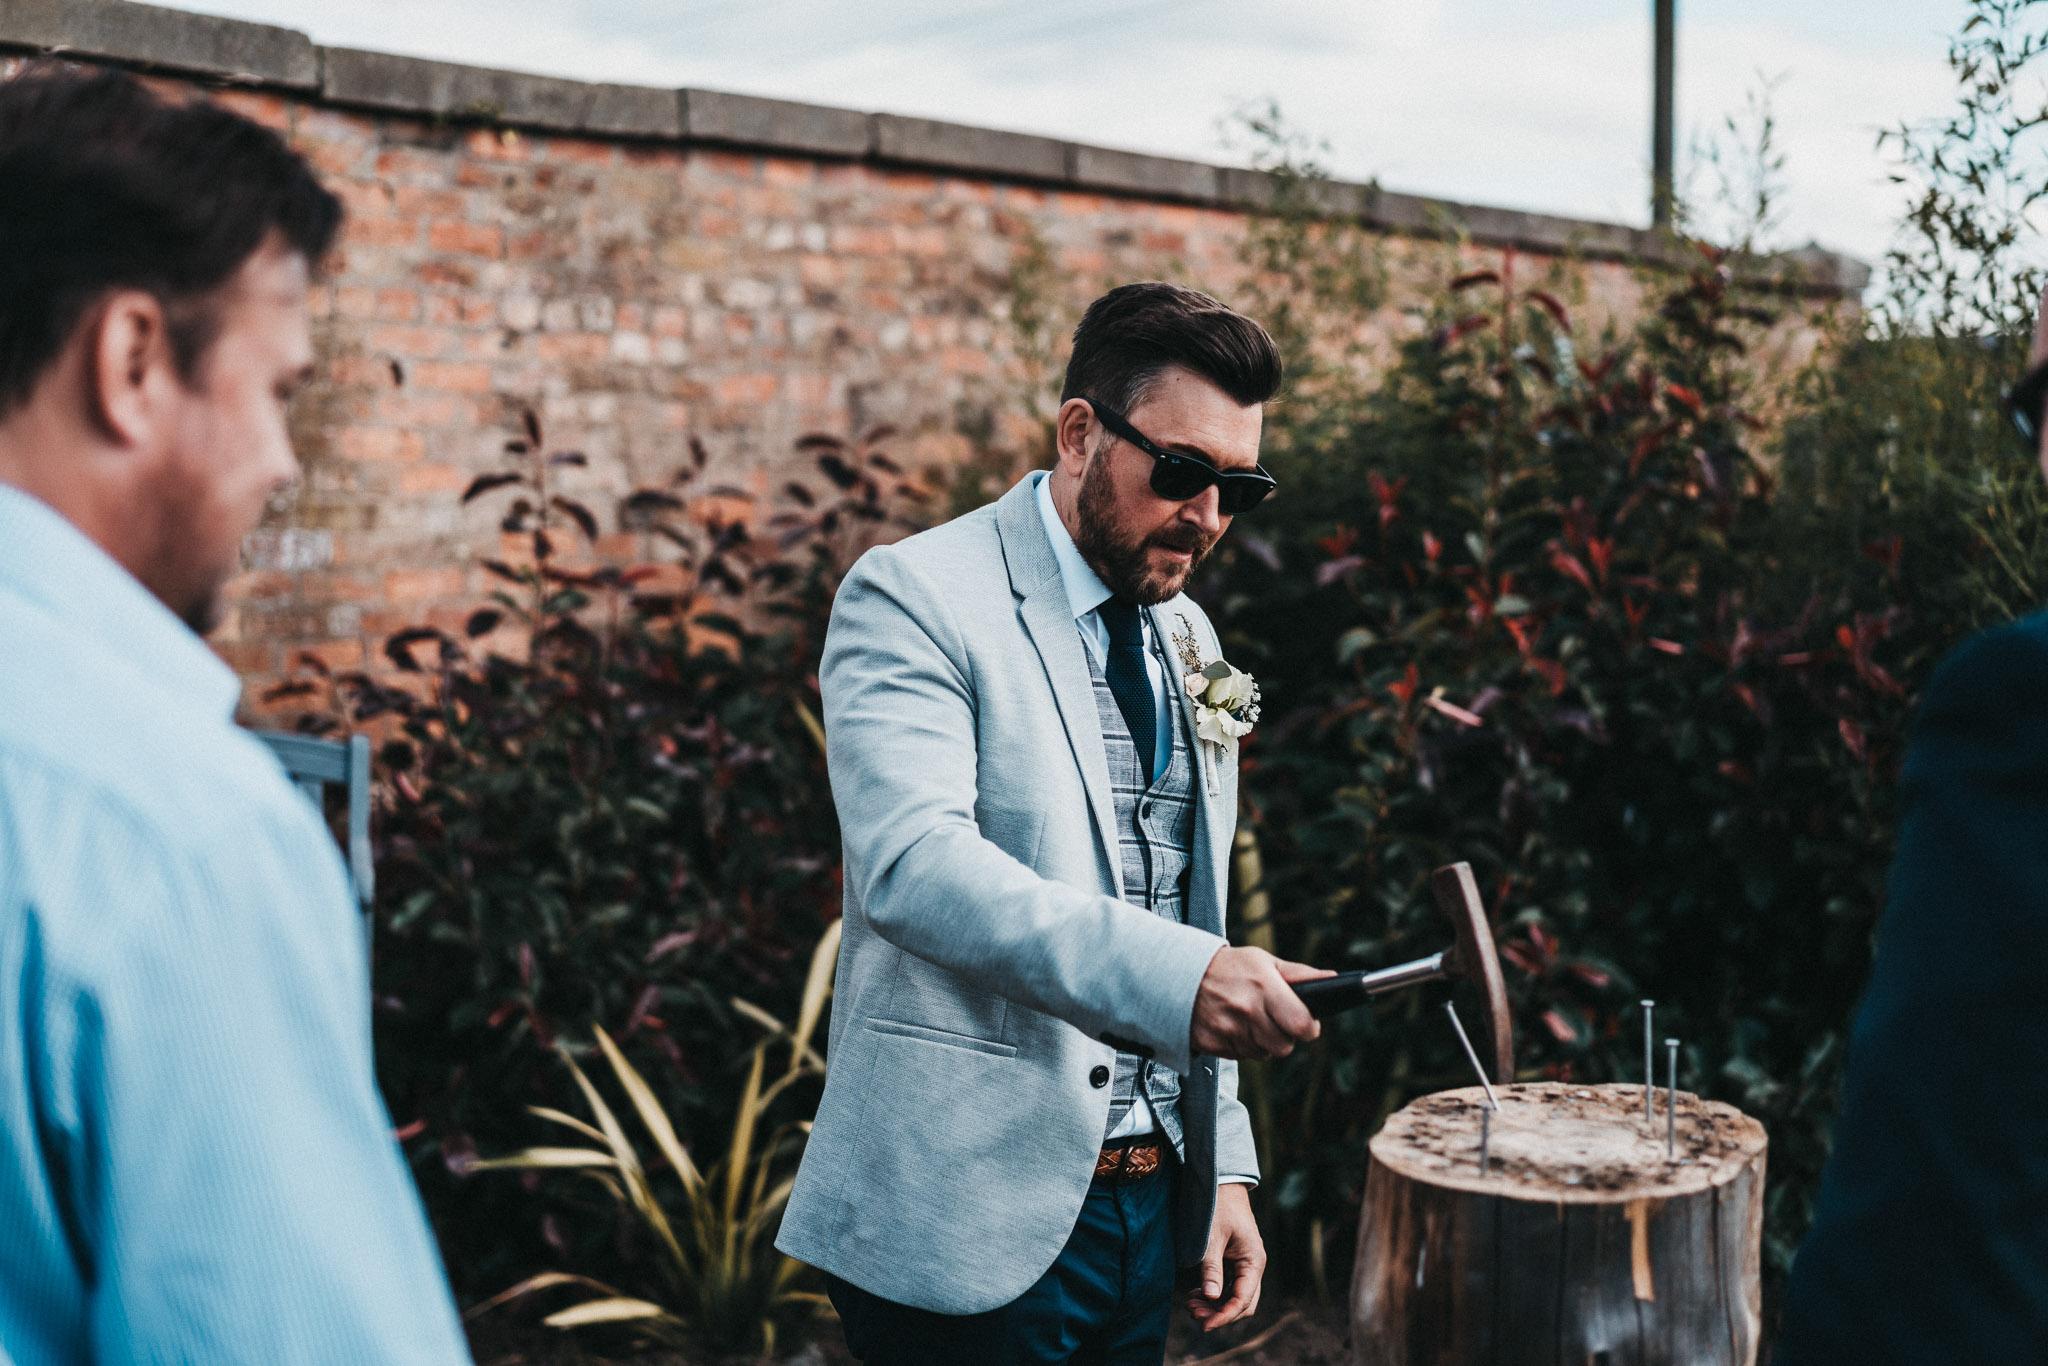 fun-wedding-games